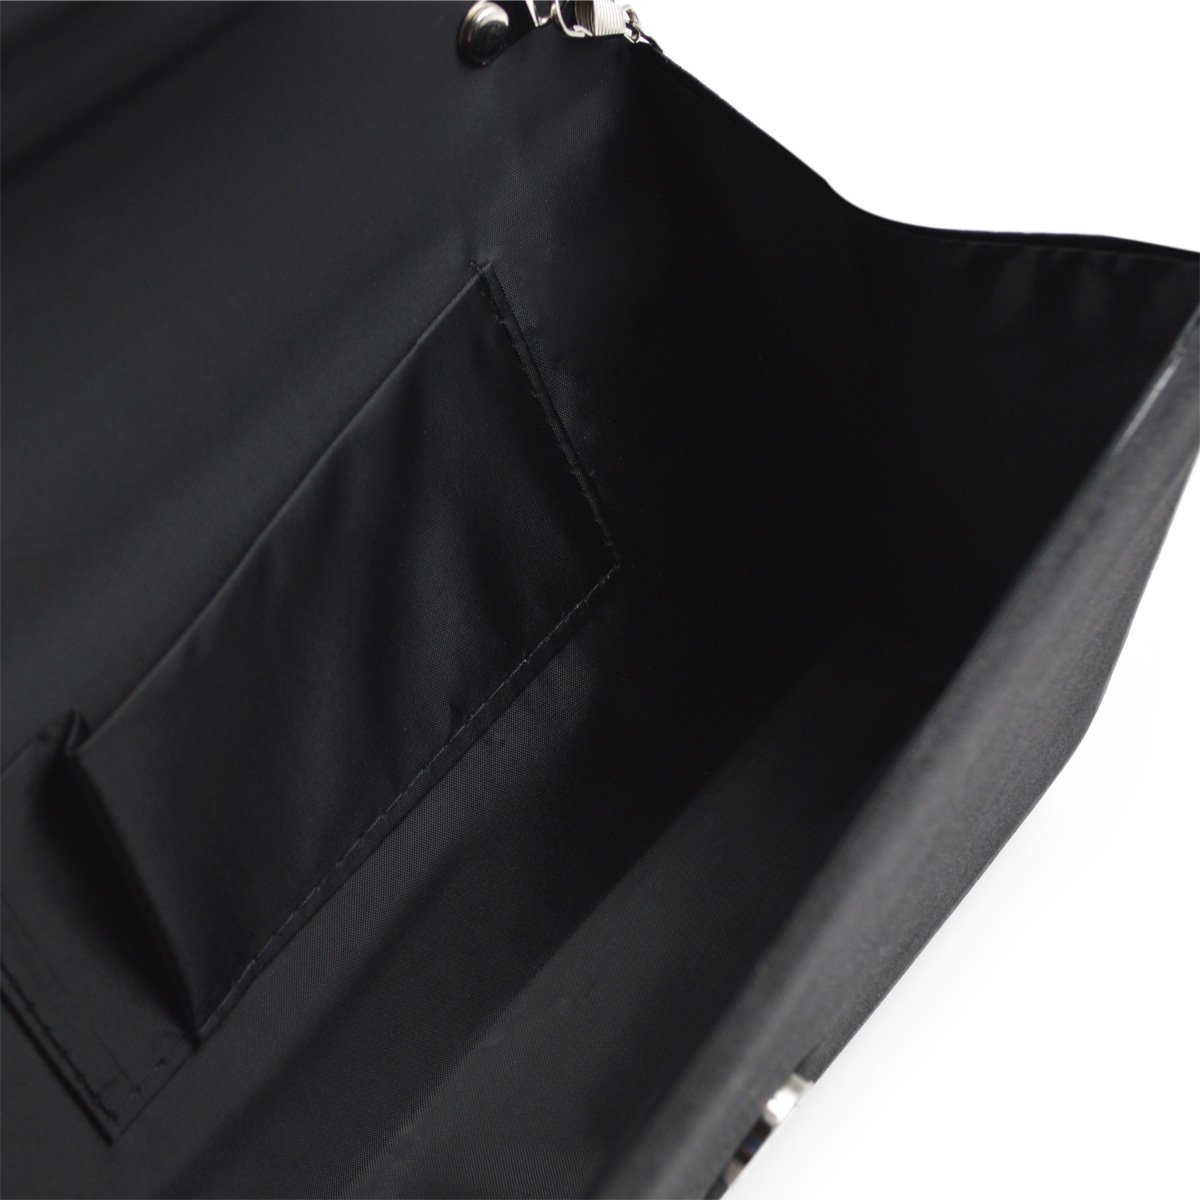 Premium Rainbow Rhinestones Pleated Front Satin Envelope Flap Clutch Evening Bag